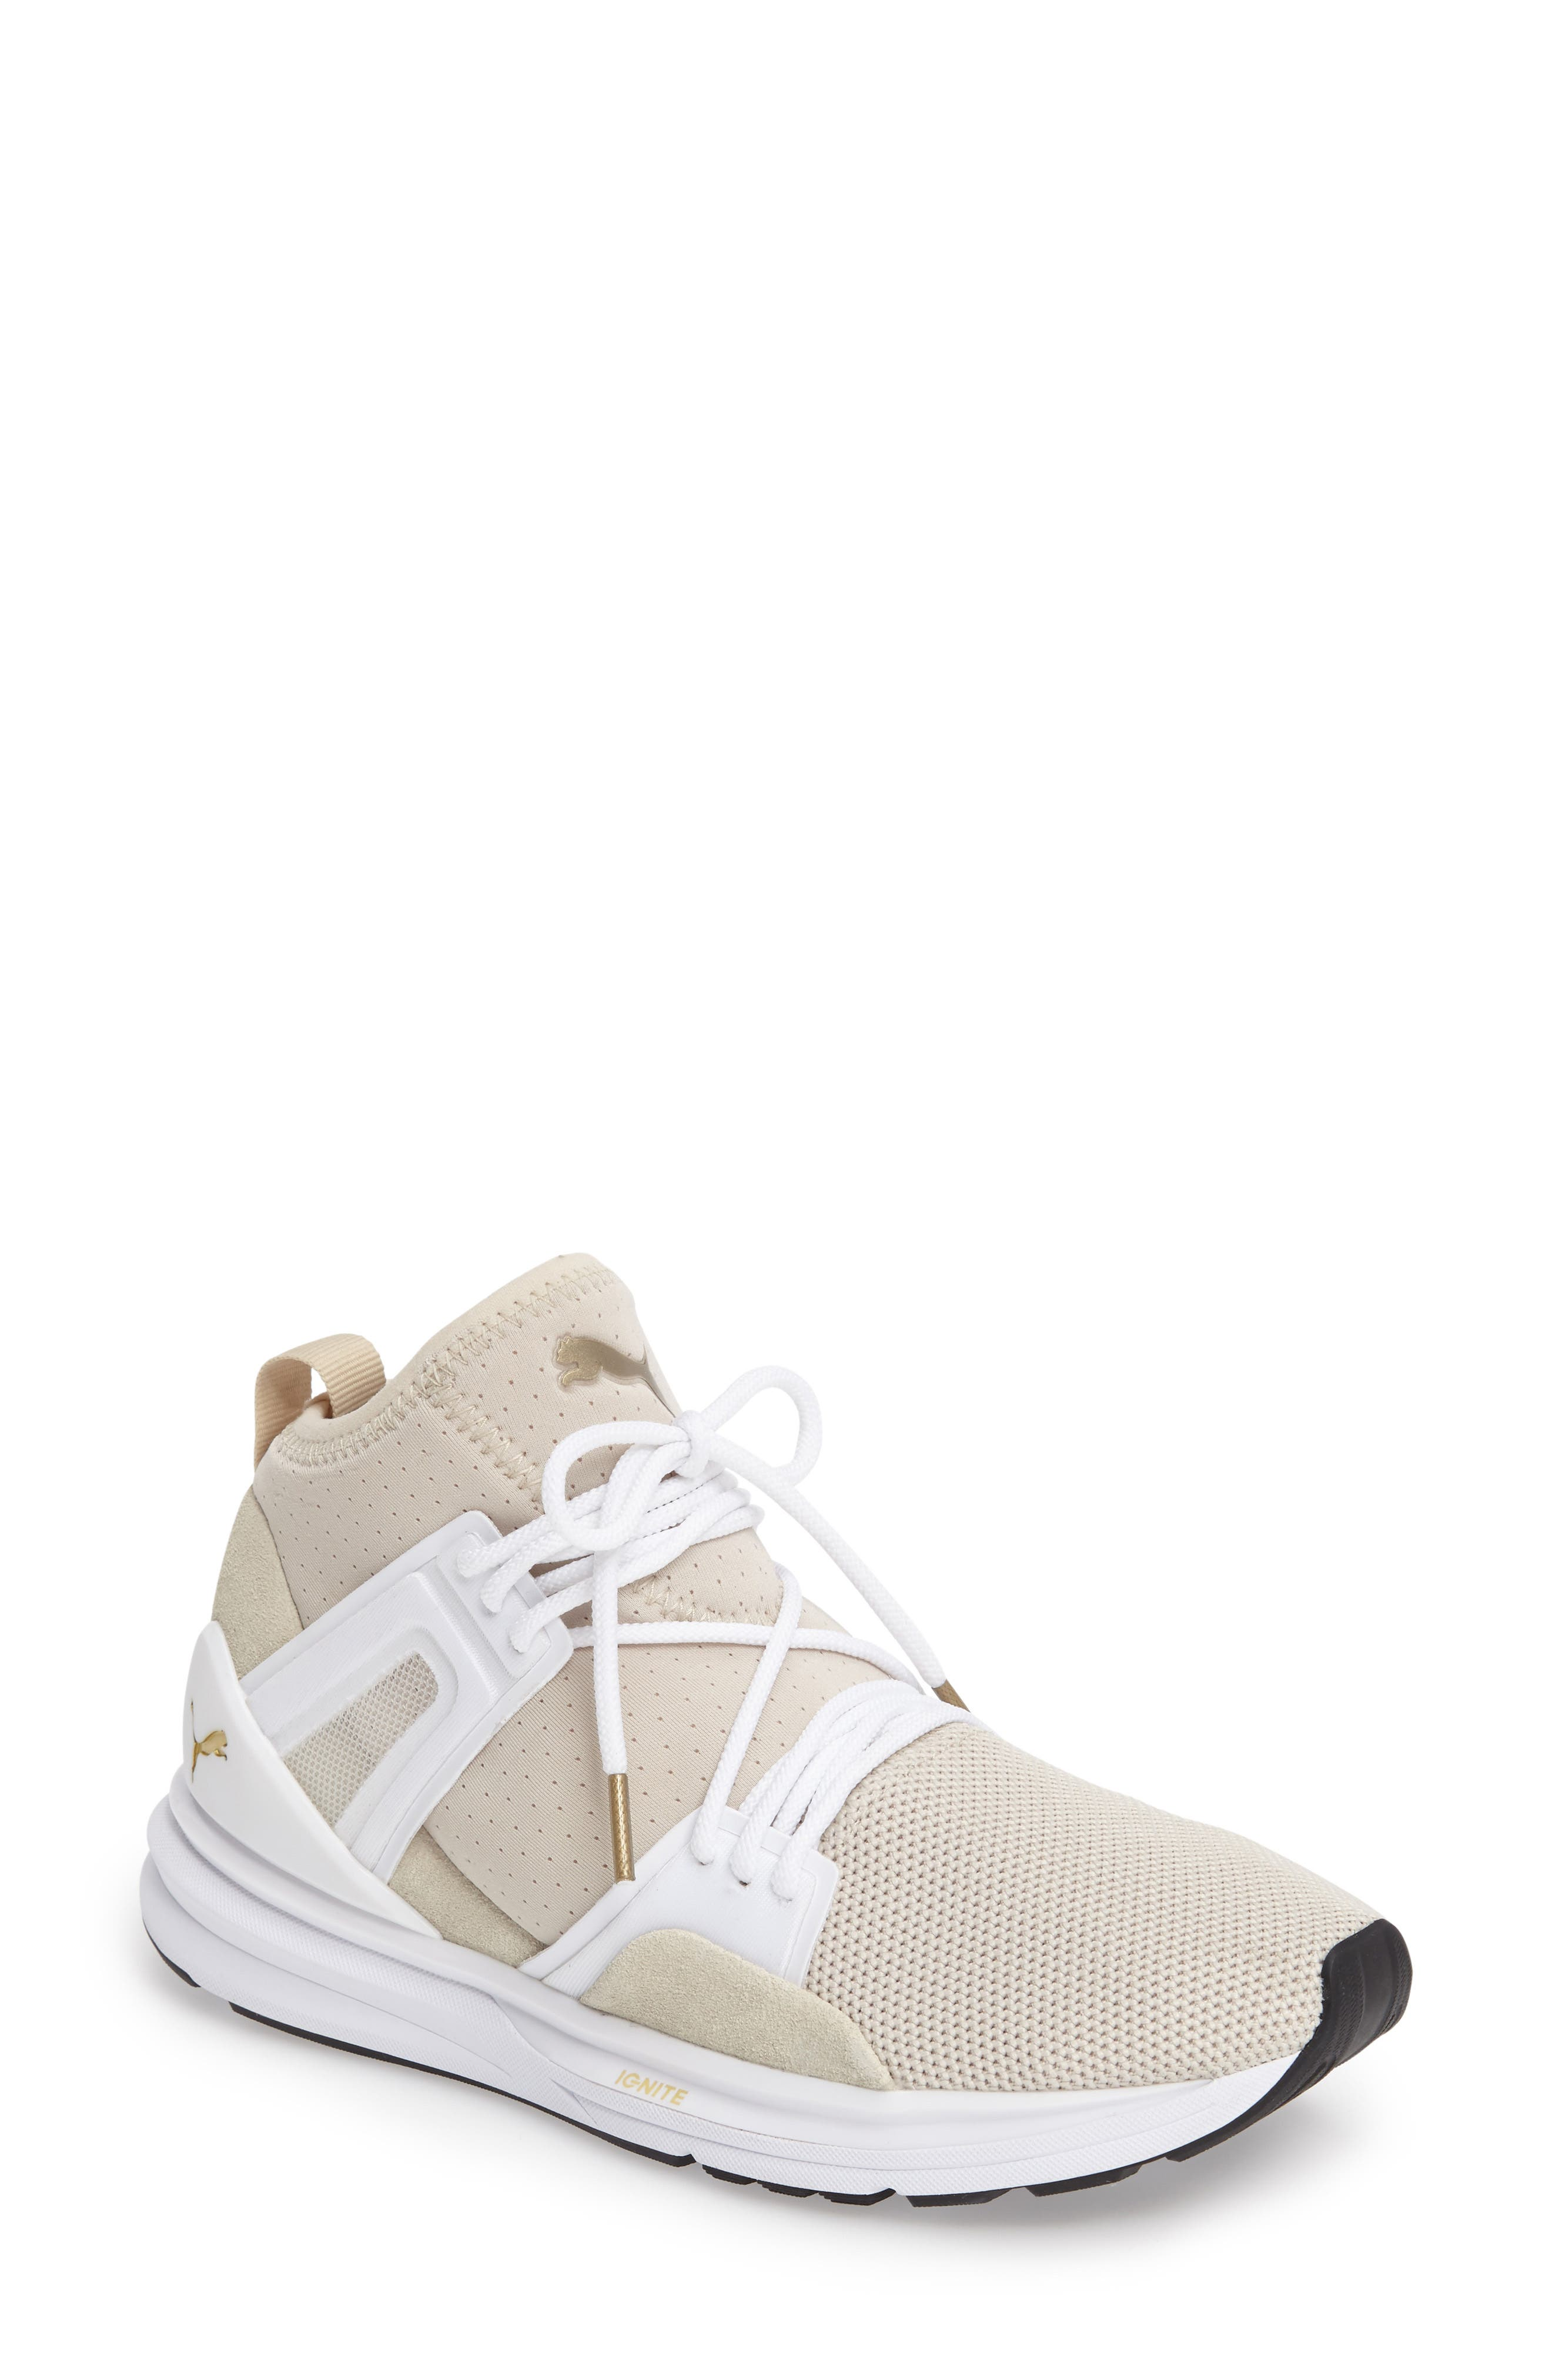 puma high tops womens. main image - puma b.o.g. limitless high top training shoe (women) puma tops womens